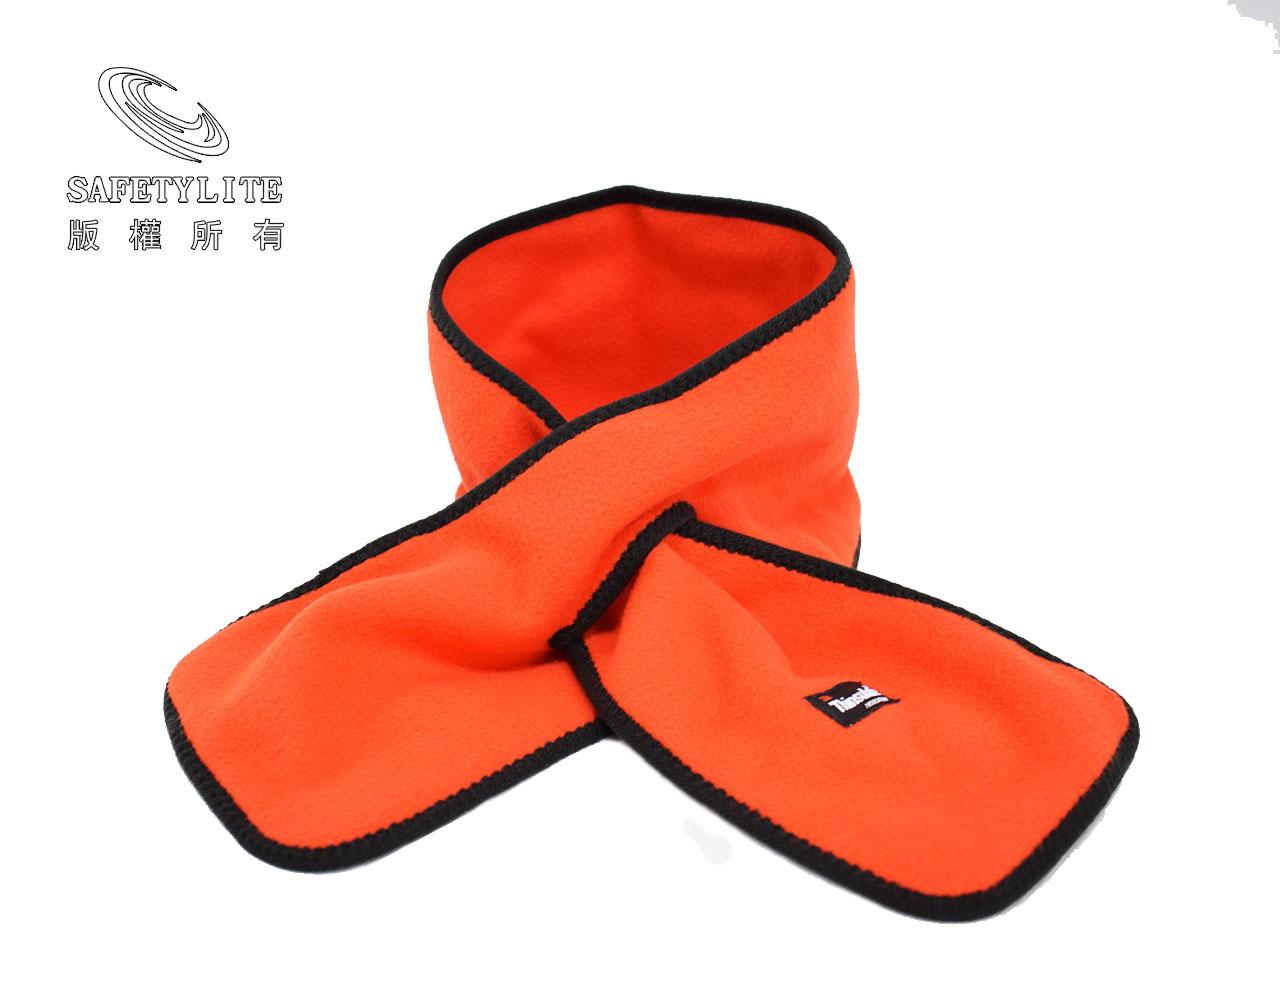 【 safetylite安心生活館】《滿899免運、滿千贈禮》入秋微涼輕柔保暖脖圍-3M Thinsulate新雪麗